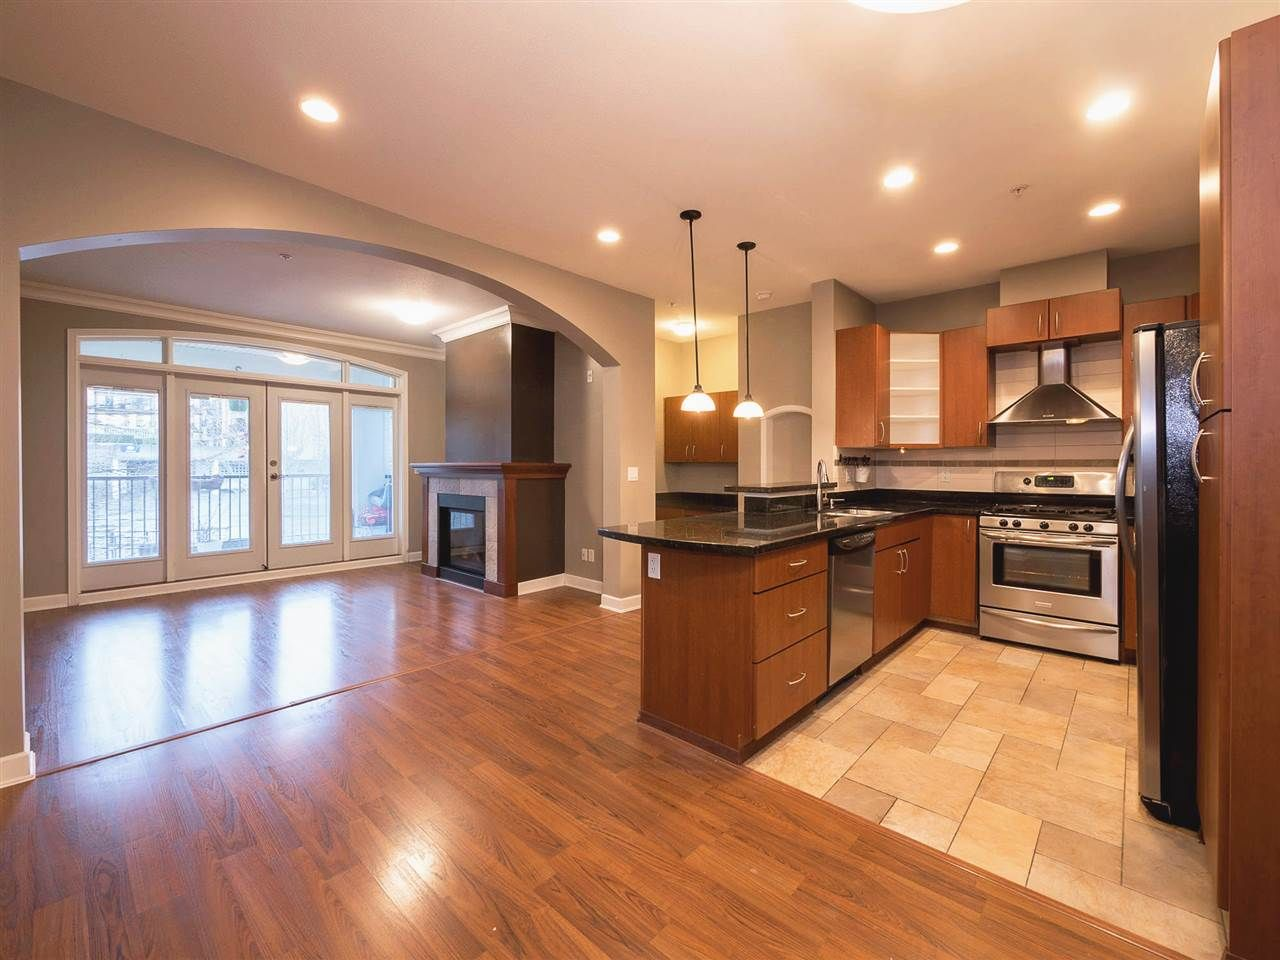 Main Photo: 210 990 ADAIR AVENUE in : Maillardville Condo for sale : MLS®# R2333727